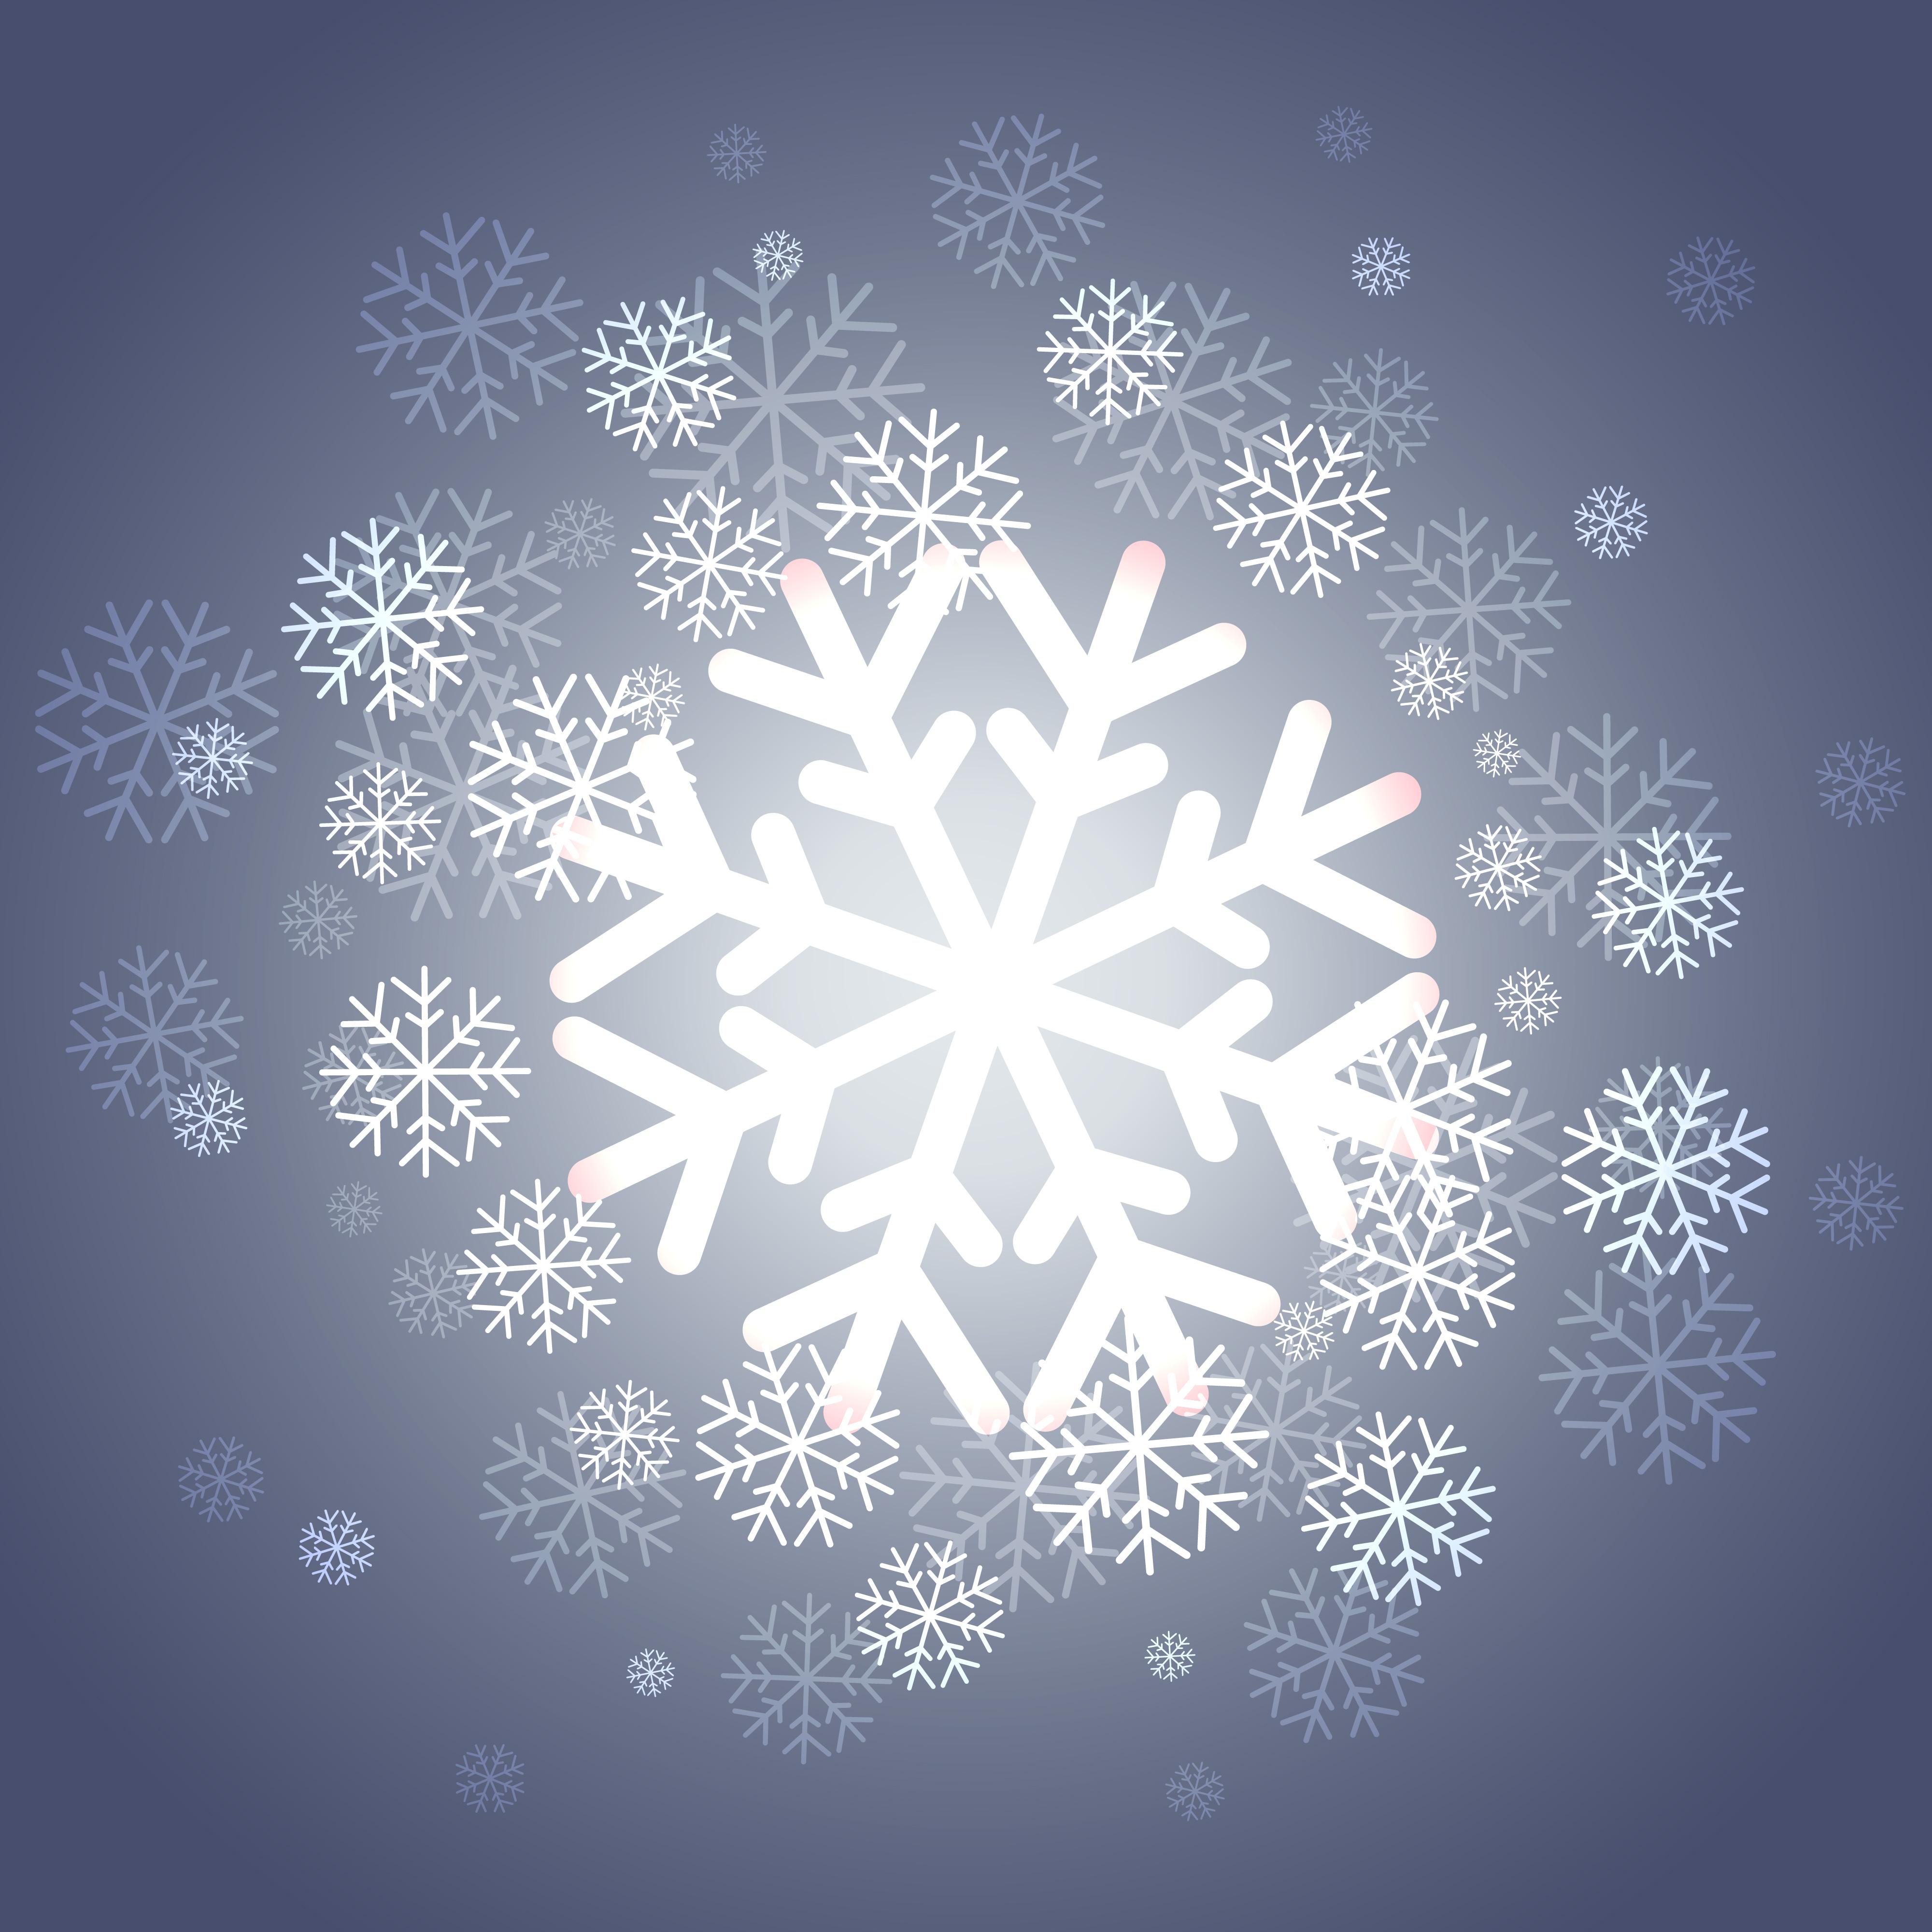 shiny christmas snowflakes